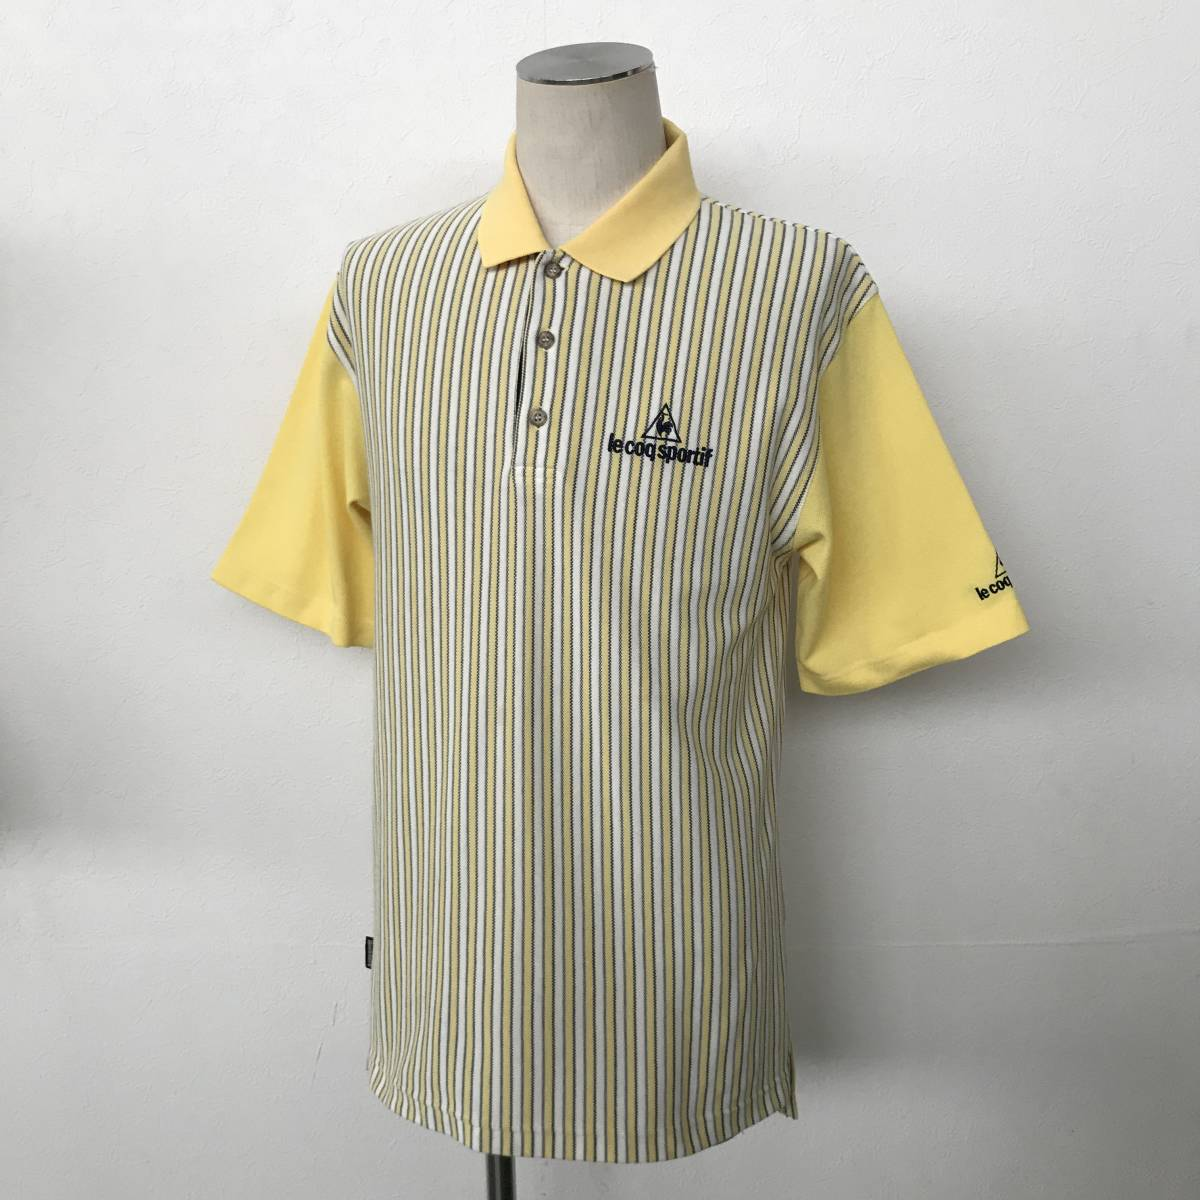 le coq sportif GOLF COLLECTION ルコック ゴルフ メンズ ストライプ柄 ロゴ刺繍入り 半袖 速乾ストレッチポロシャツ 美品 size S/L_画像1